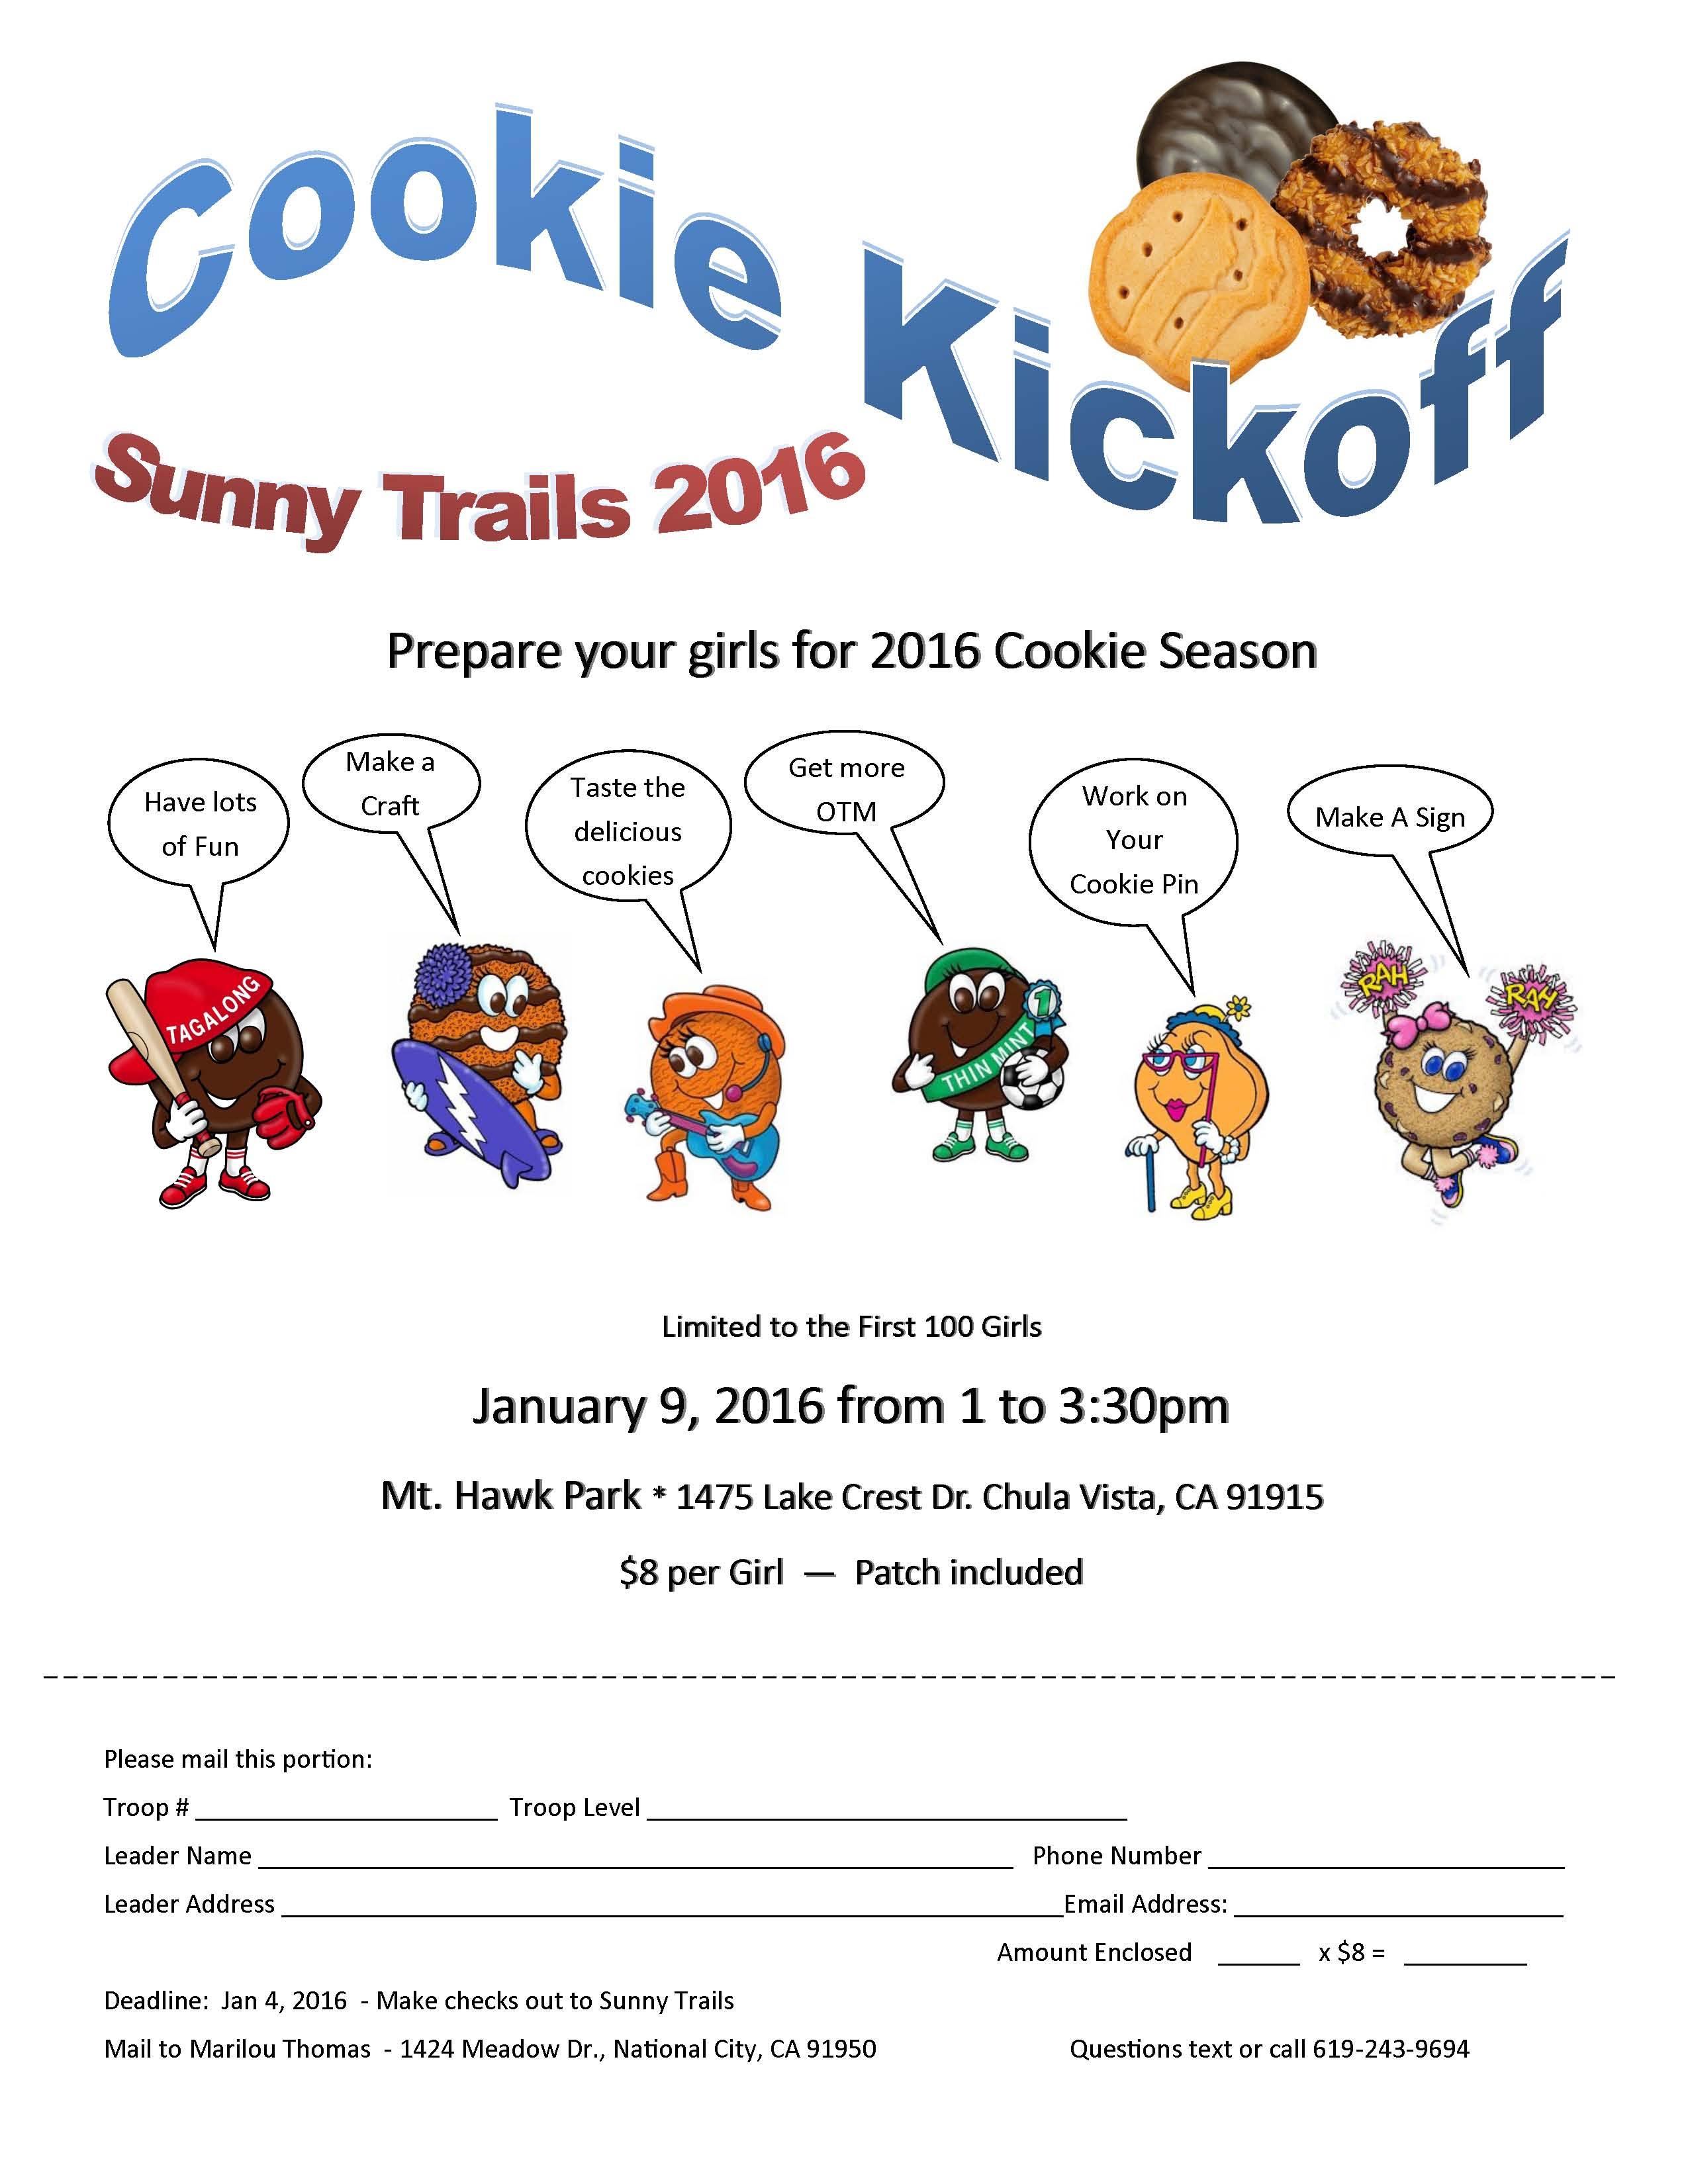 Cookie Kickoff flyer